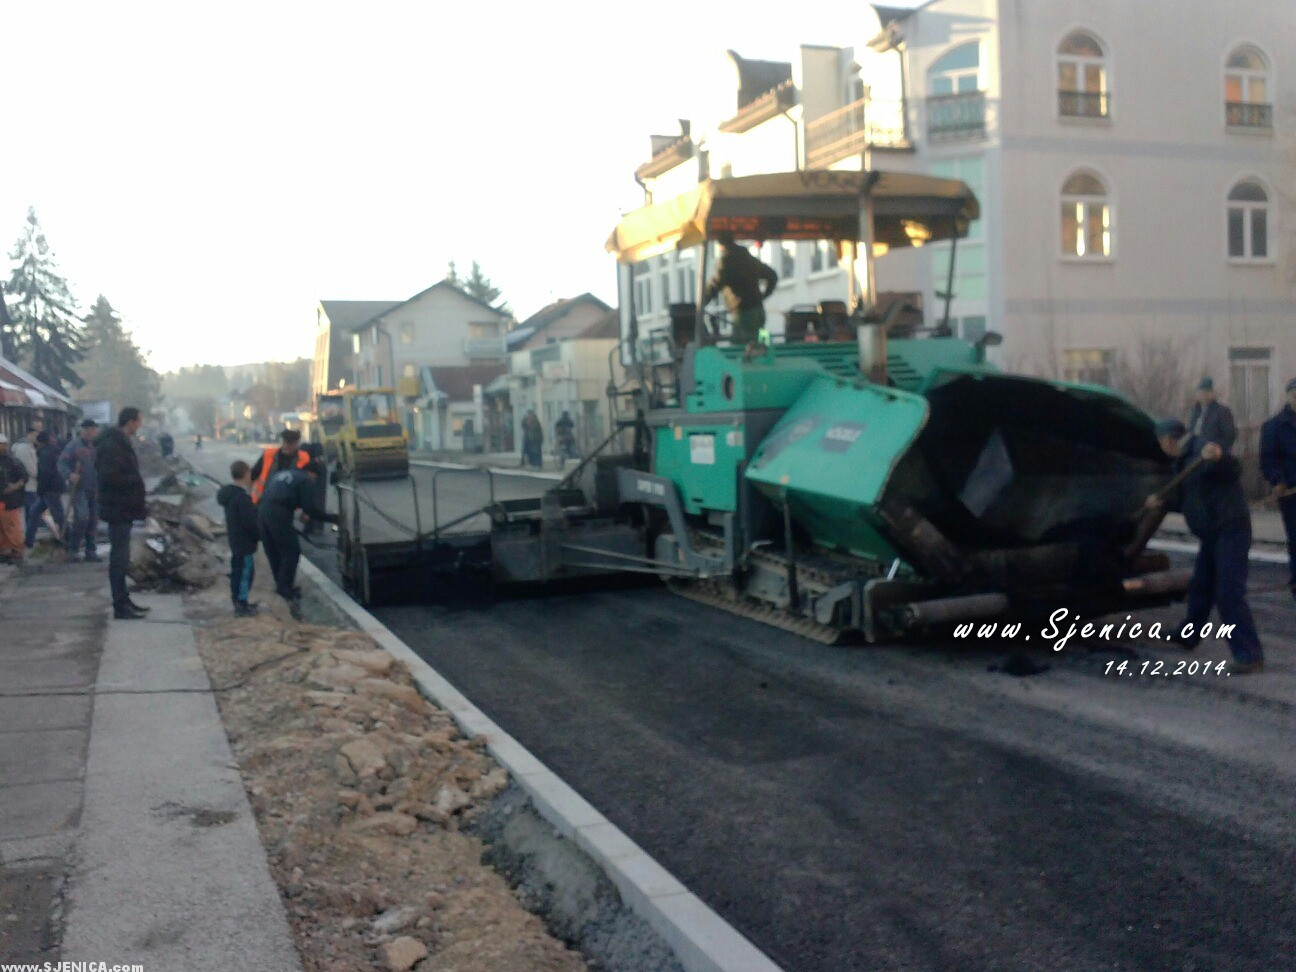 Drugi sloj asfalta - Sjenica 14.12.2014.